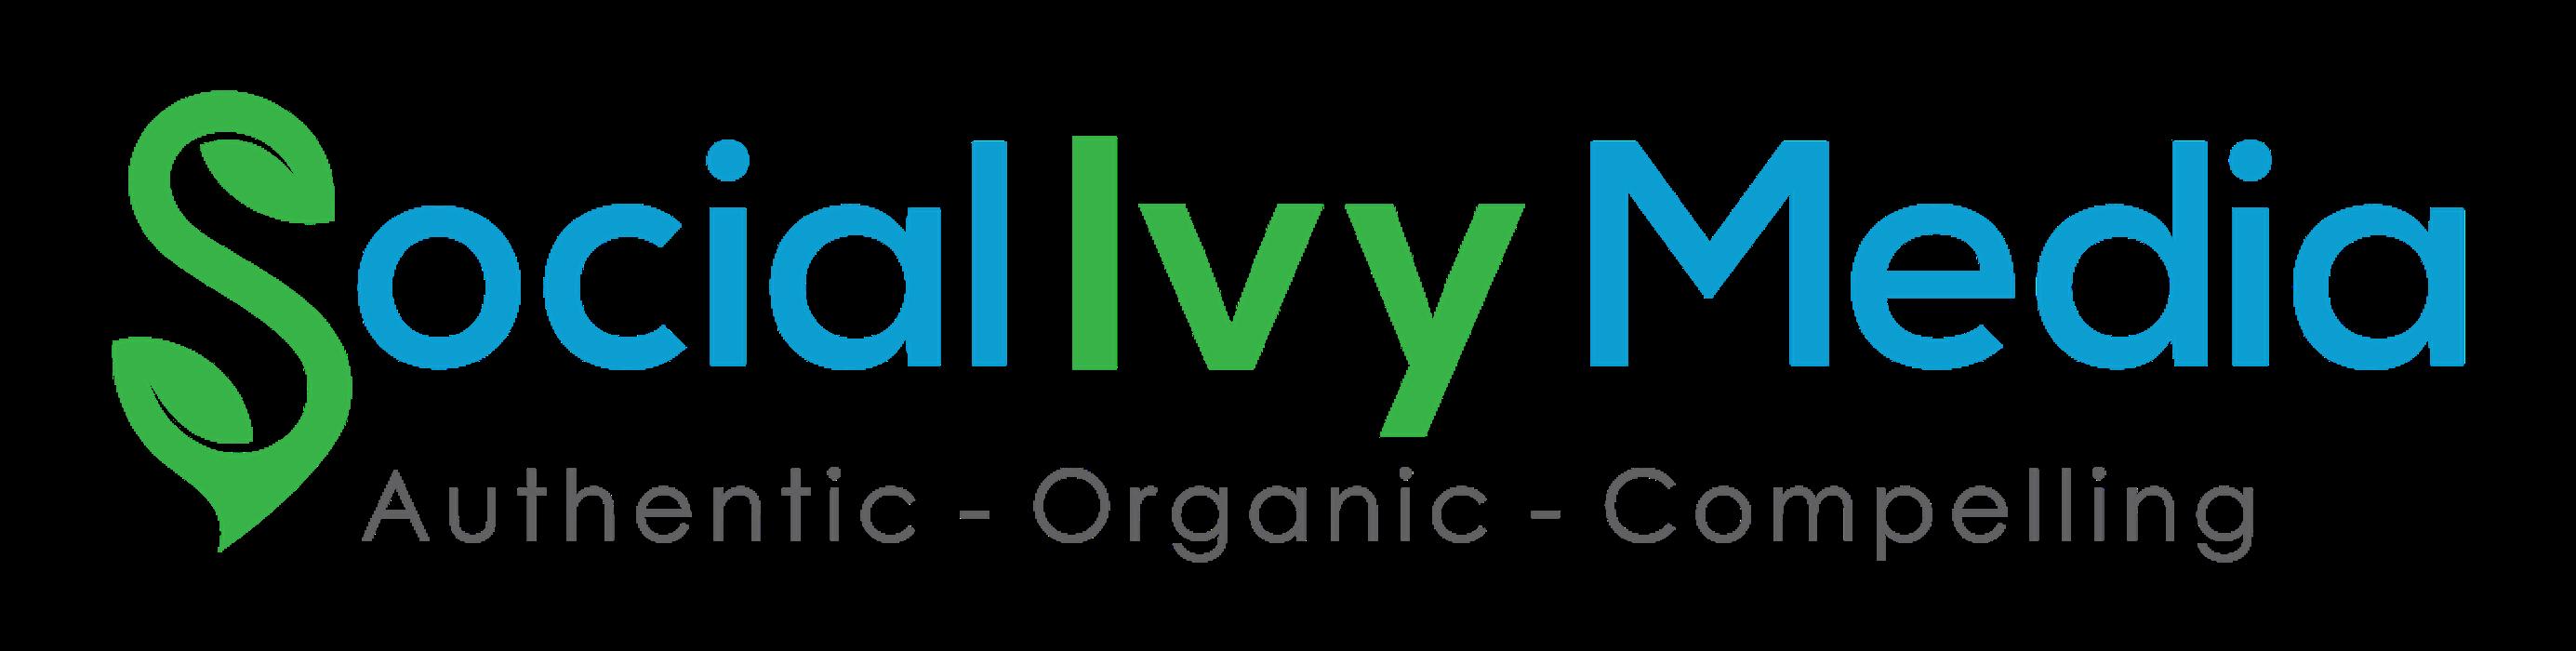 Social Ivy Media - Clearwater, FL